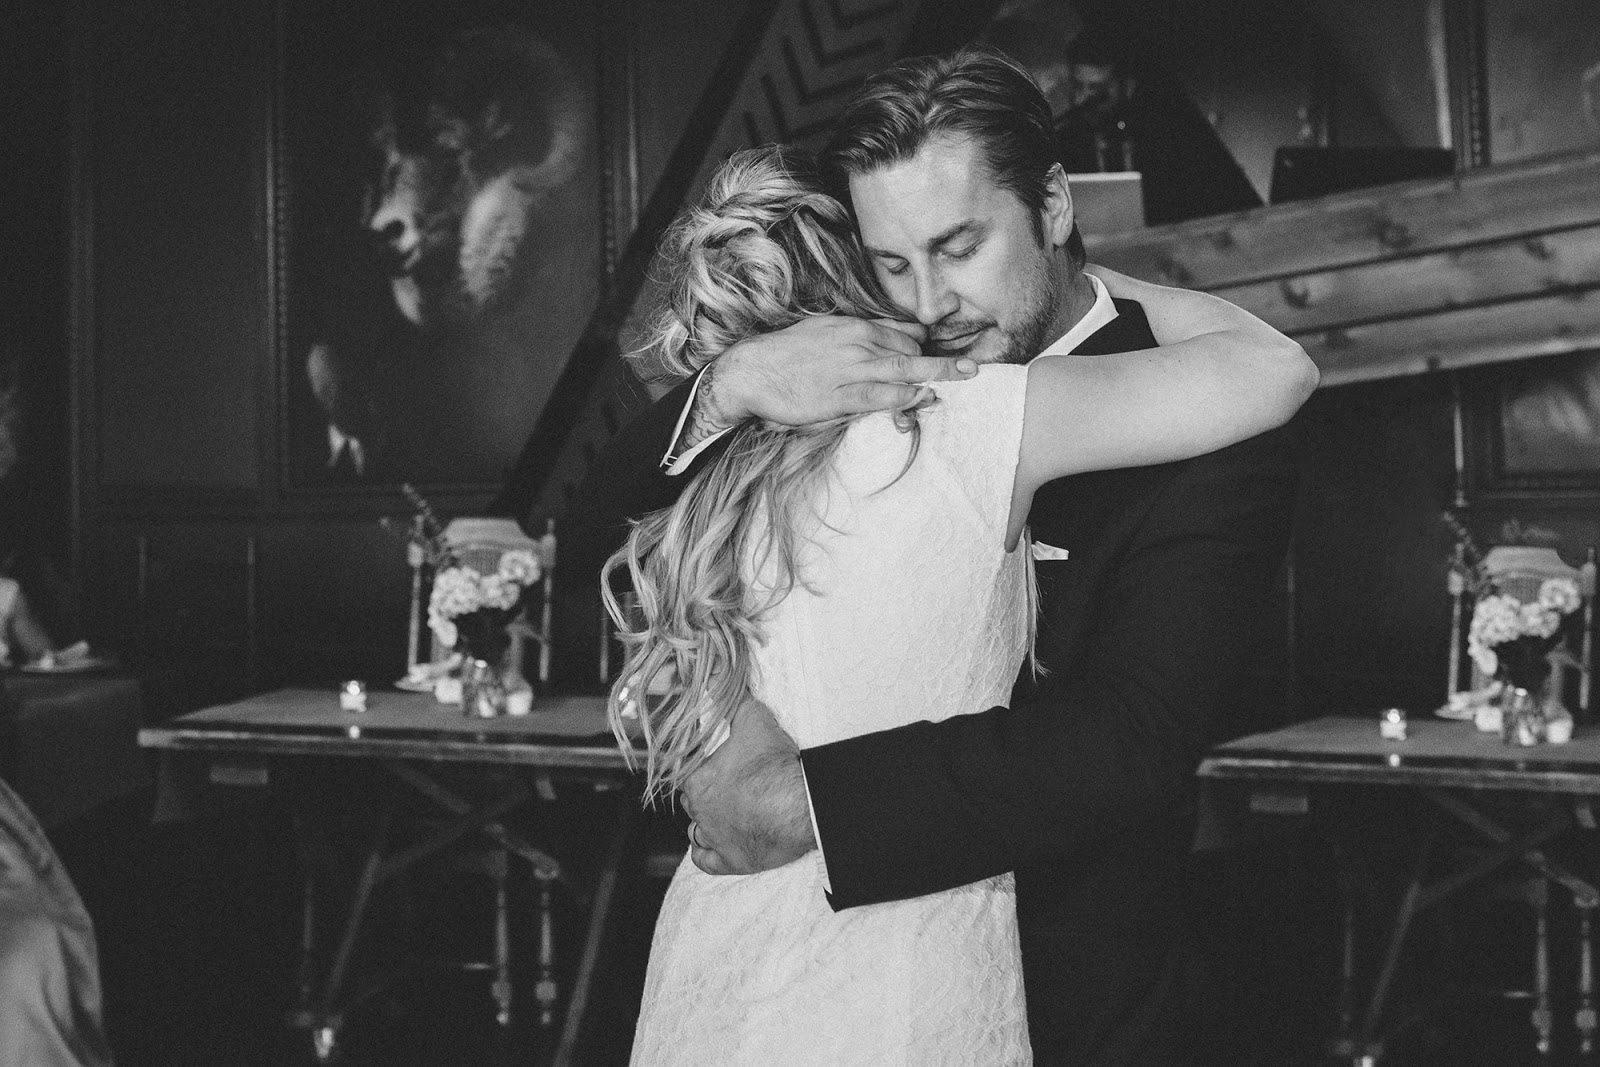 Wedding at Porta Asbury Park | Documentary wedding photographer cassiecastellaw.com